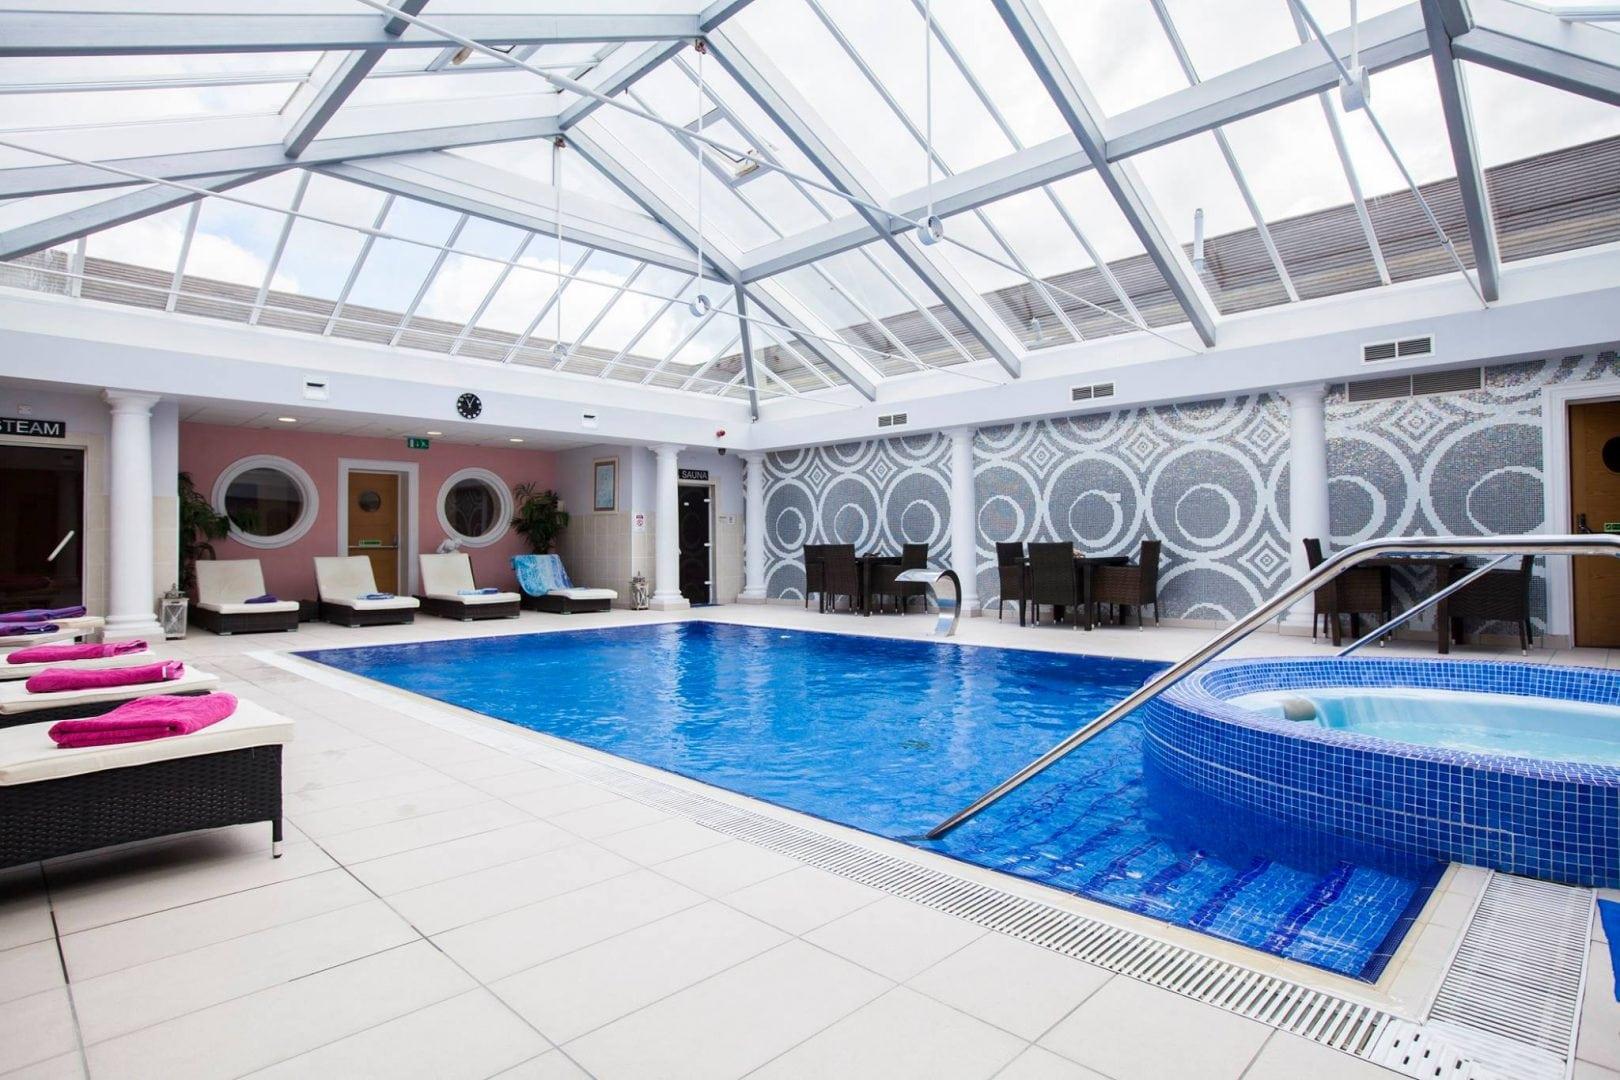 Spa & Fitness Membership | Dudsbury Golf Club, Hotel & Spa